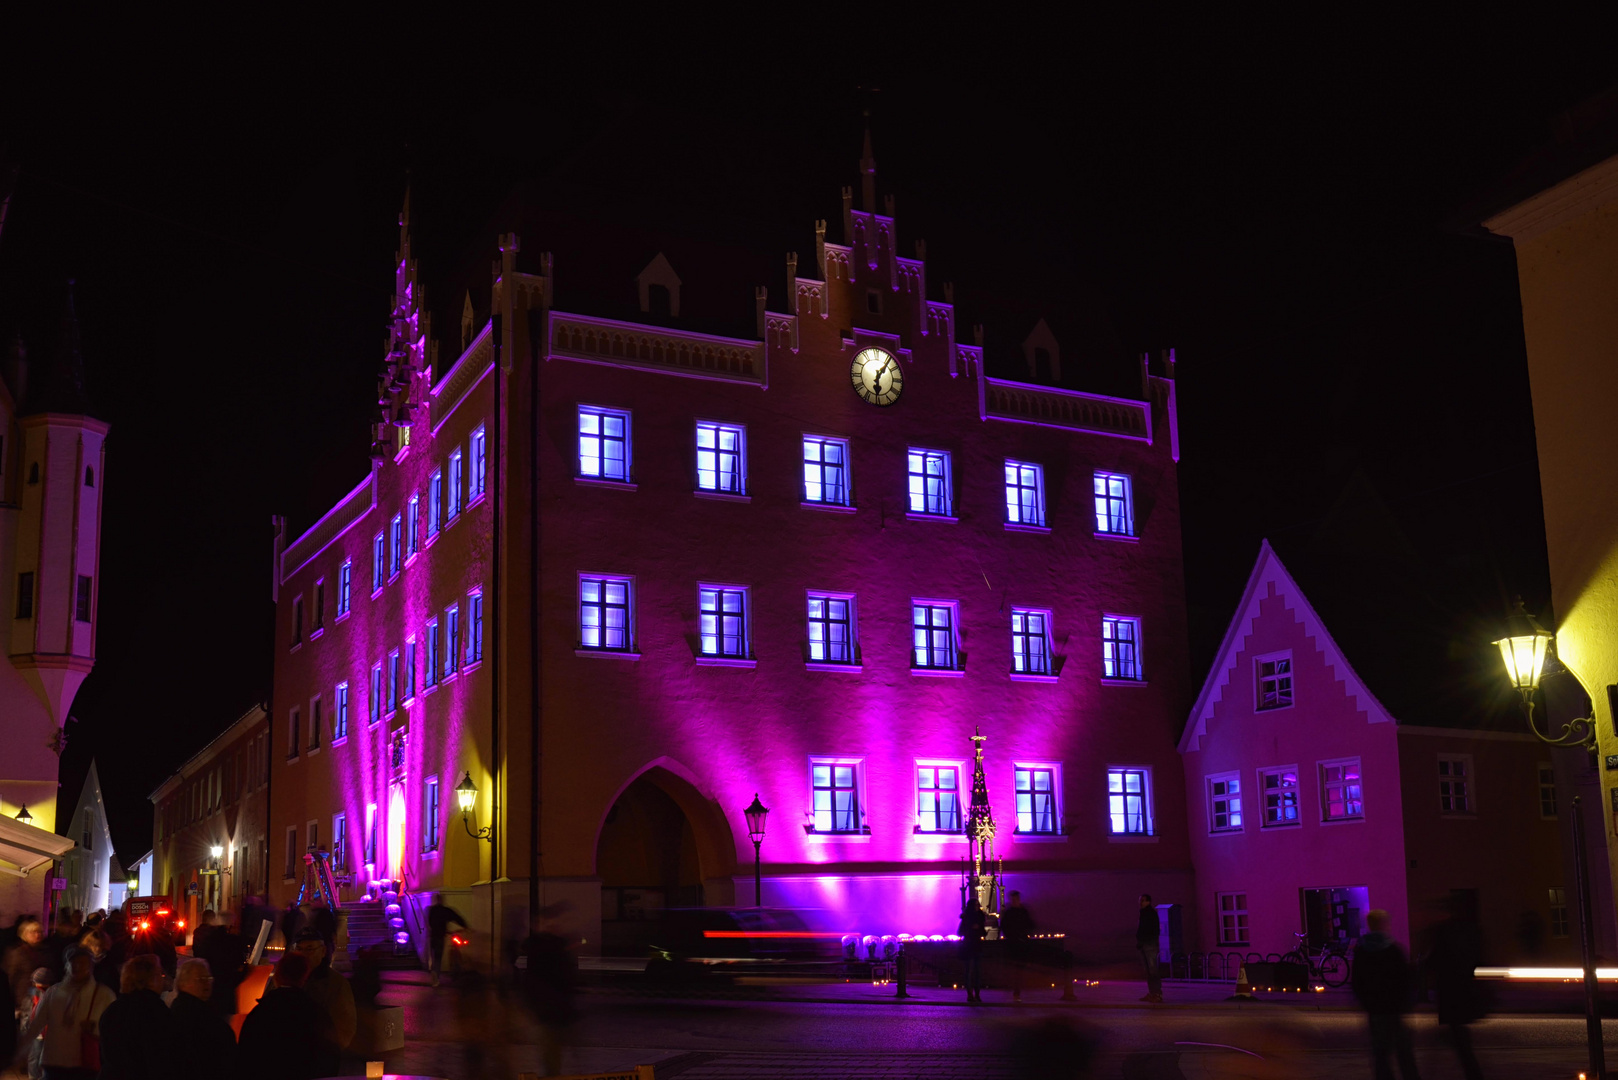 late night shopping Donauwörth